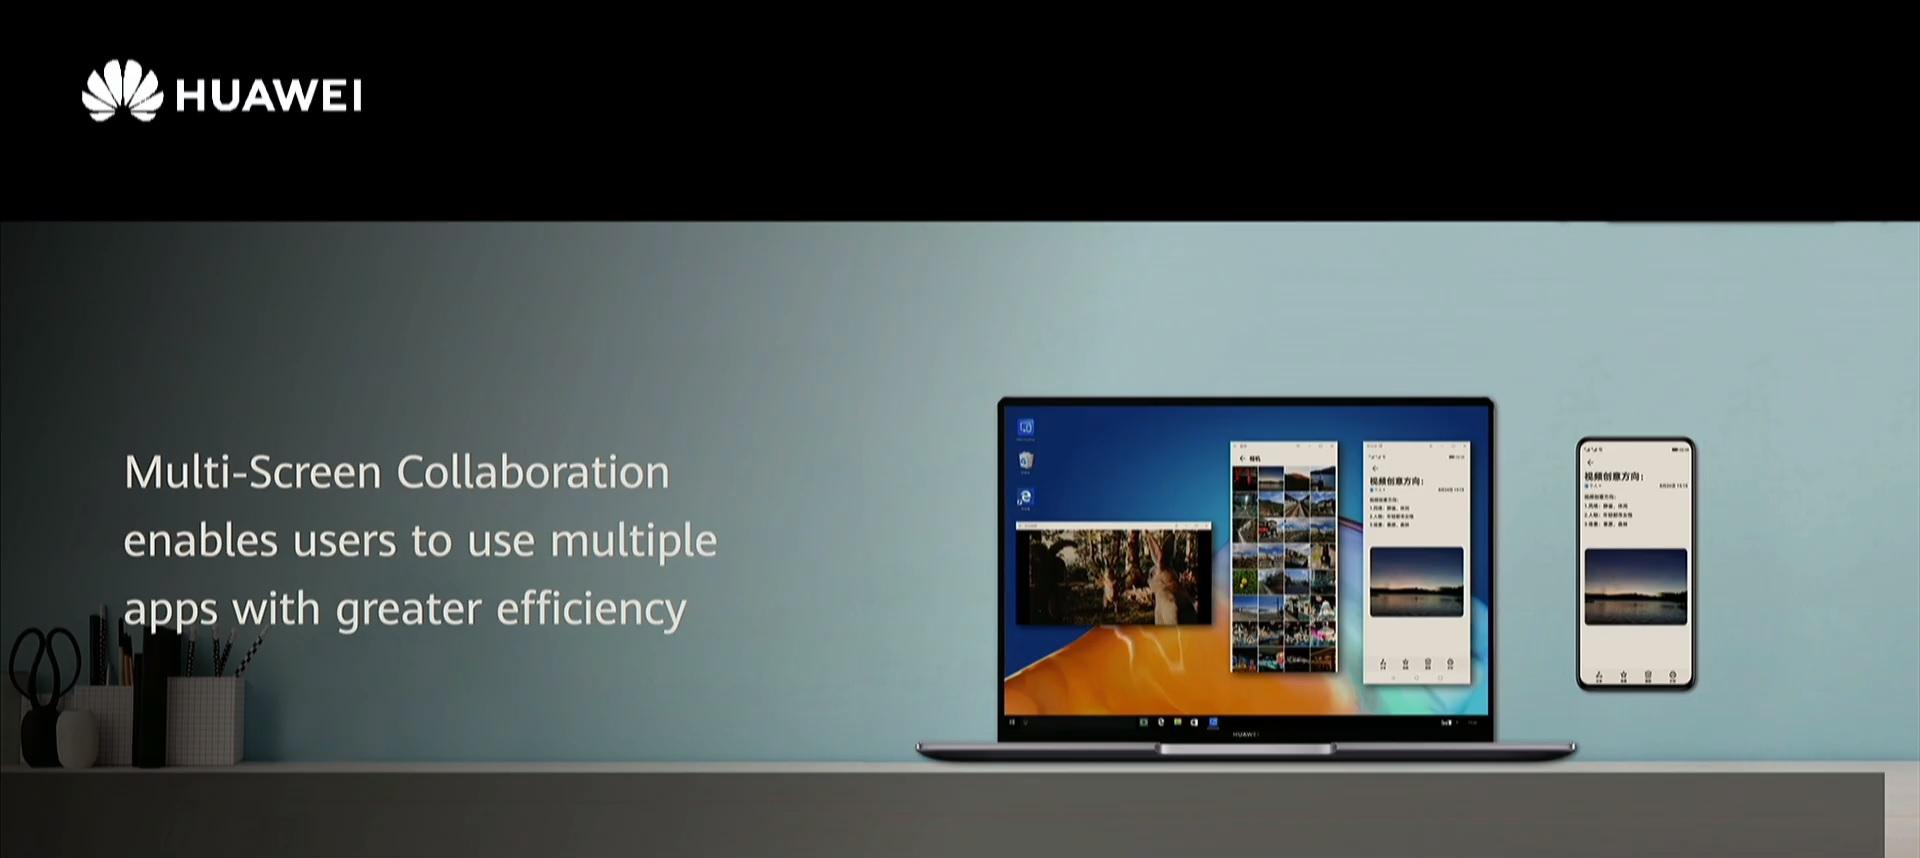 Huawei EMUI 11 Multi-Screen Collaboration